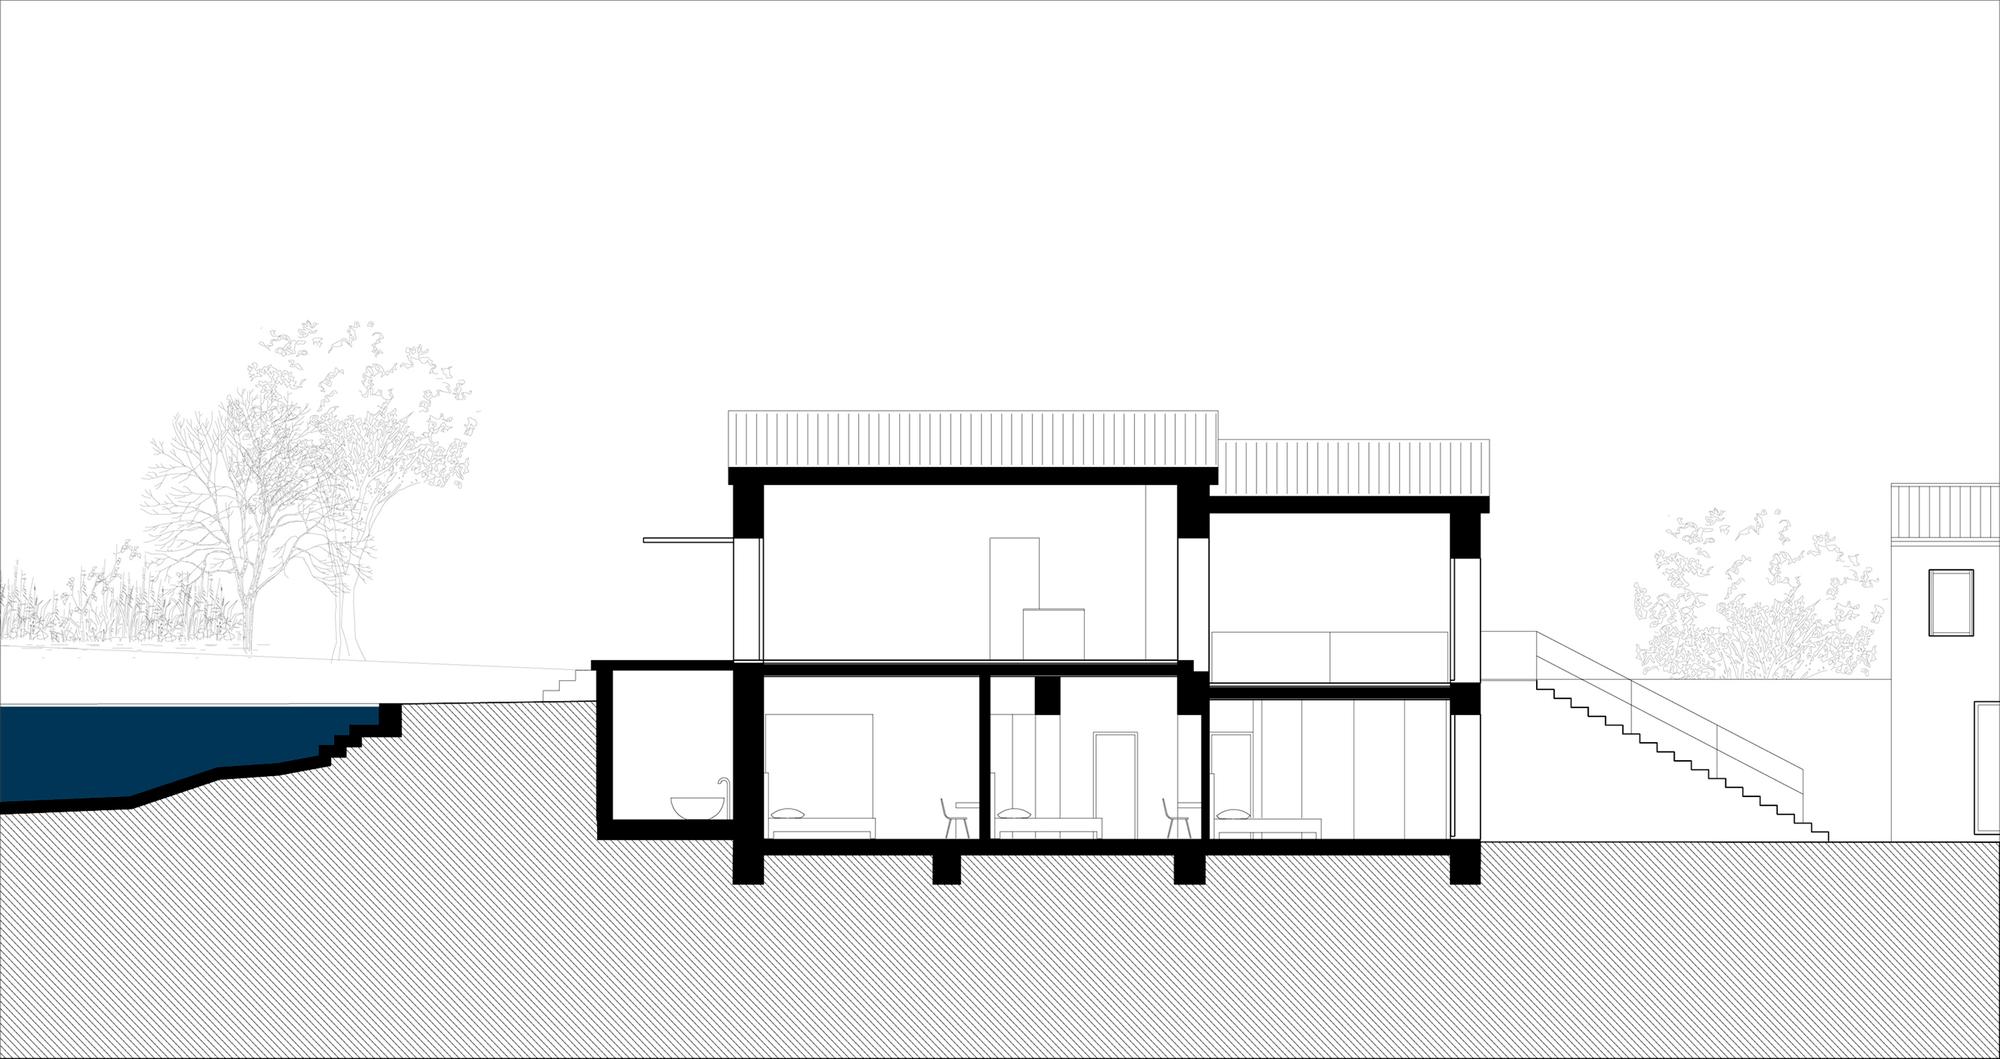 537194d3c07a804e4e000058_villa-cp-zest-architecture_villa_cp_section